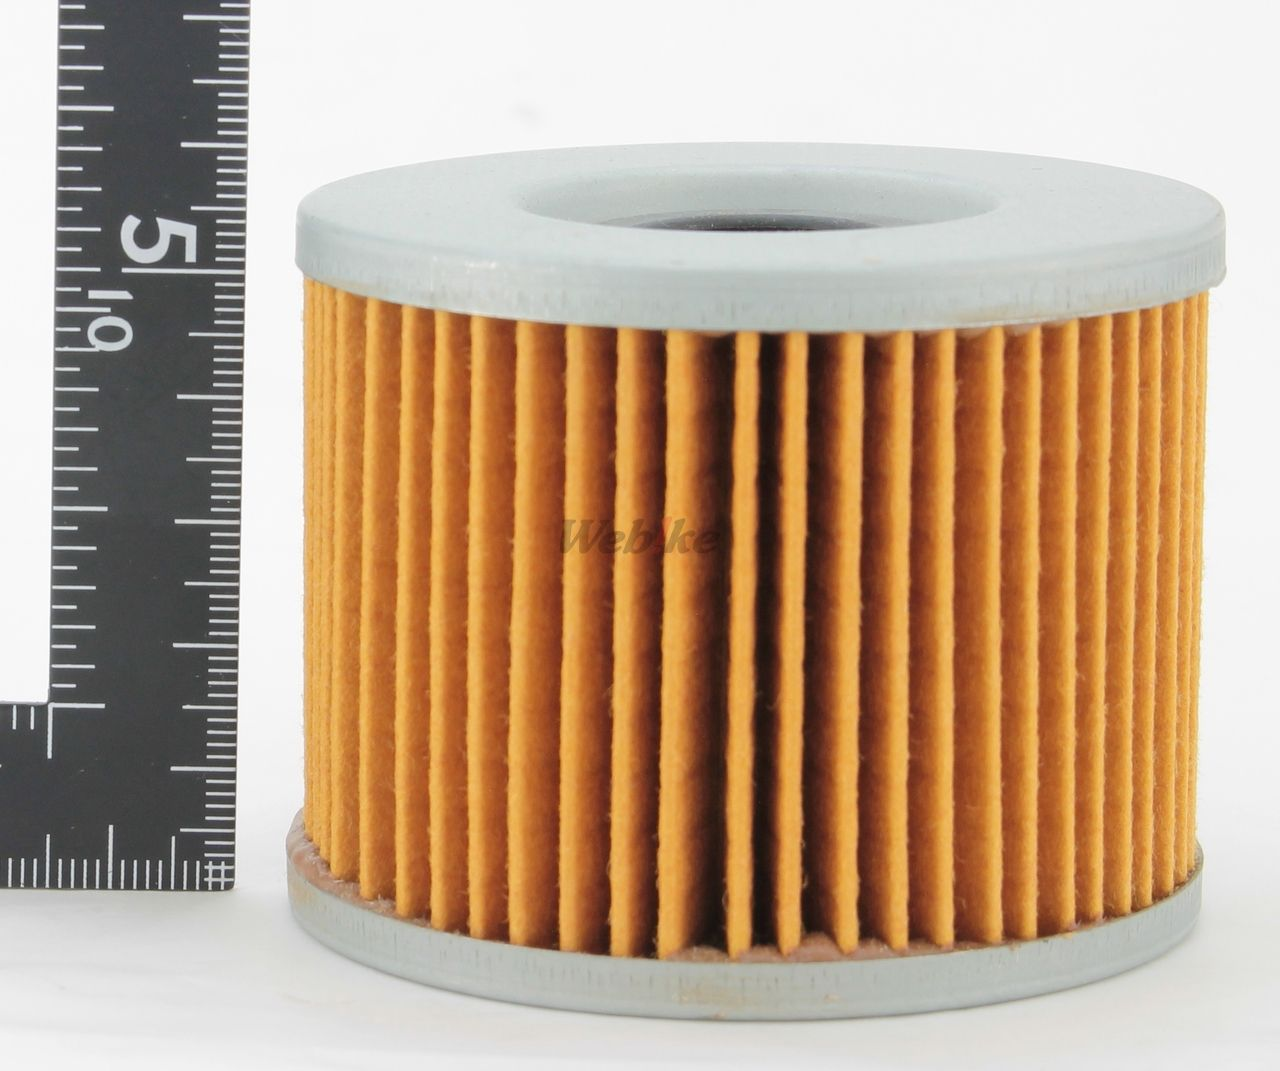 【ALBA】機油濾芯 - 「Webike-摩托百貨」